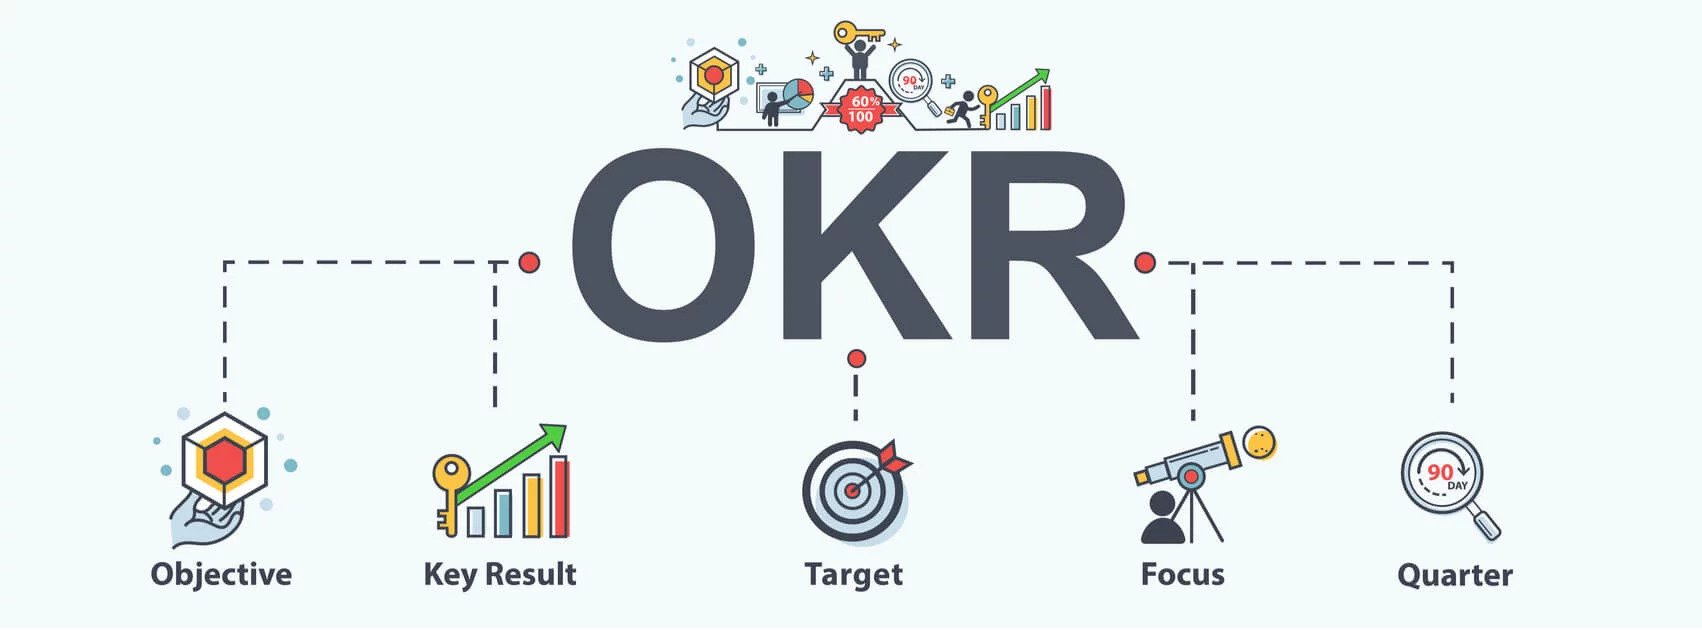 Como implantar a metodologia OKR na empresa?